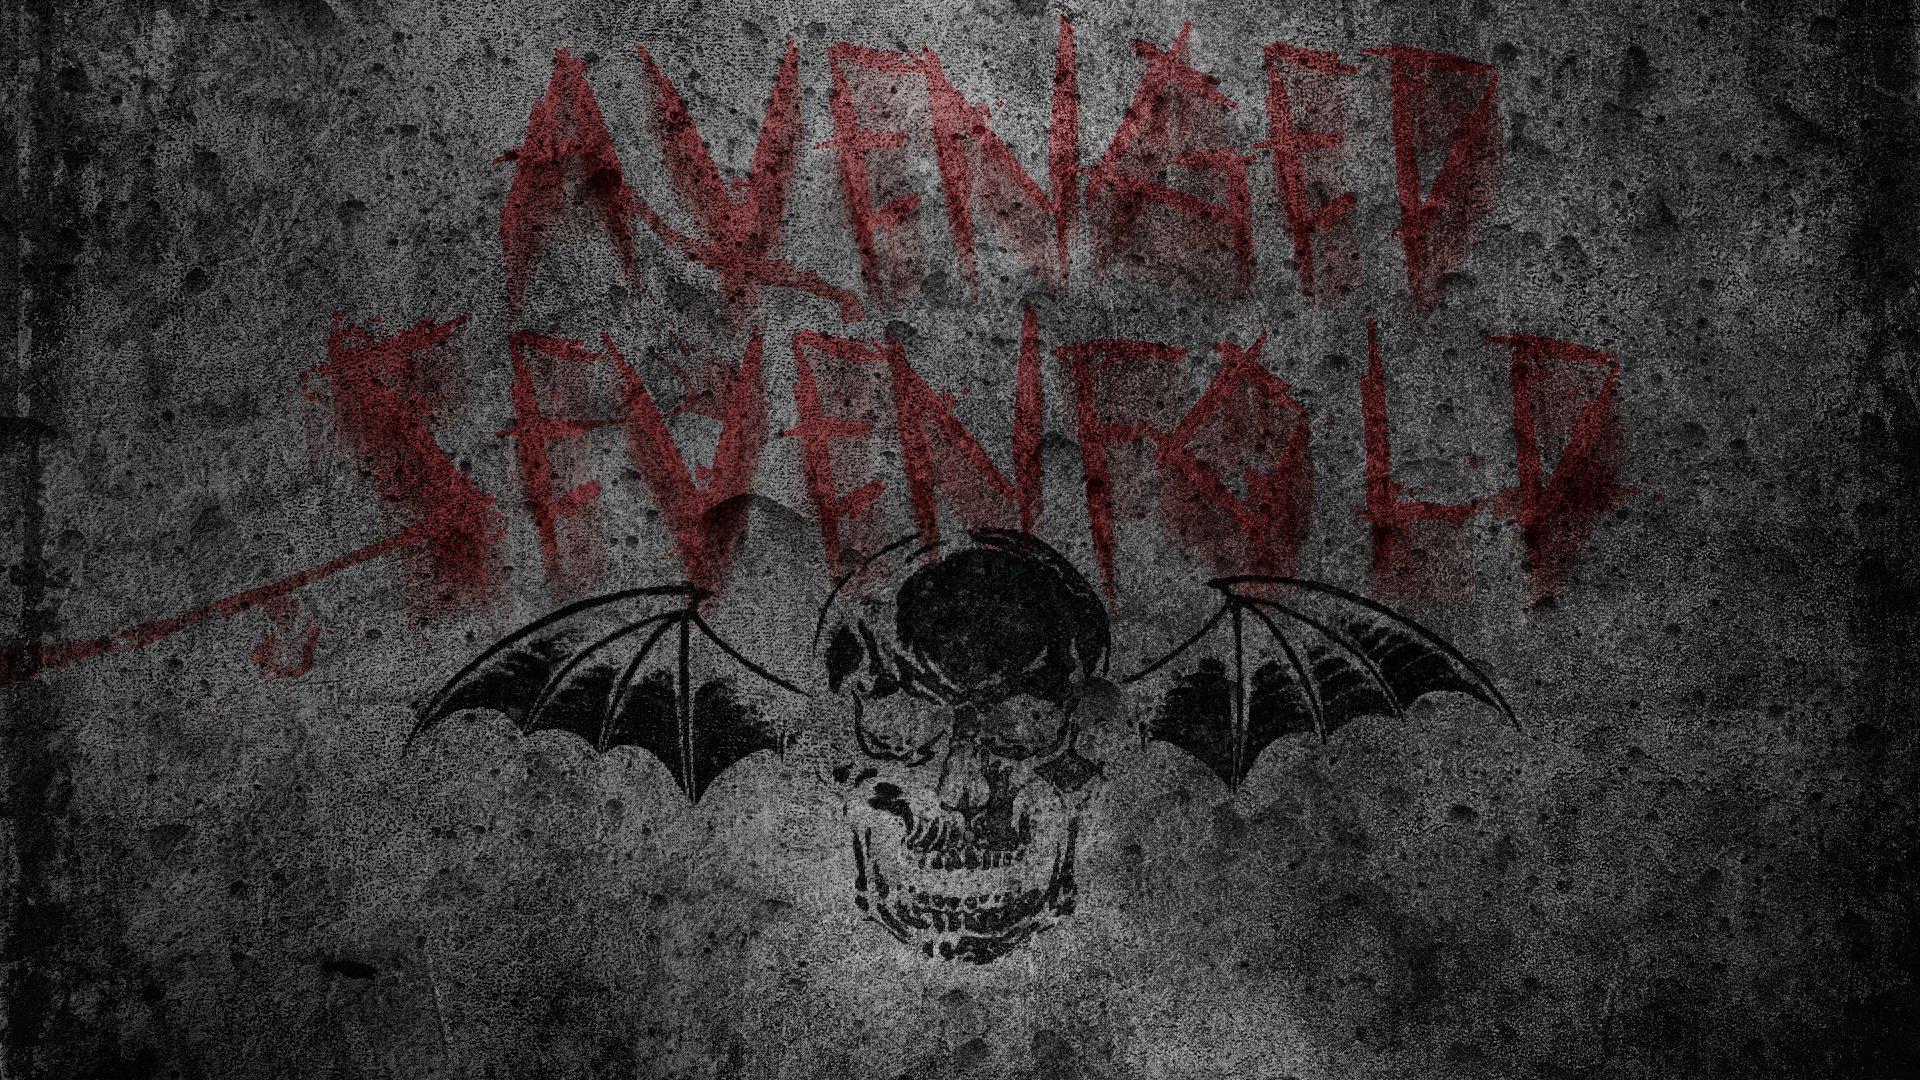 avenged sevenfold wallpaper hiddensoul fan art other   Quotekocom 1920x1080